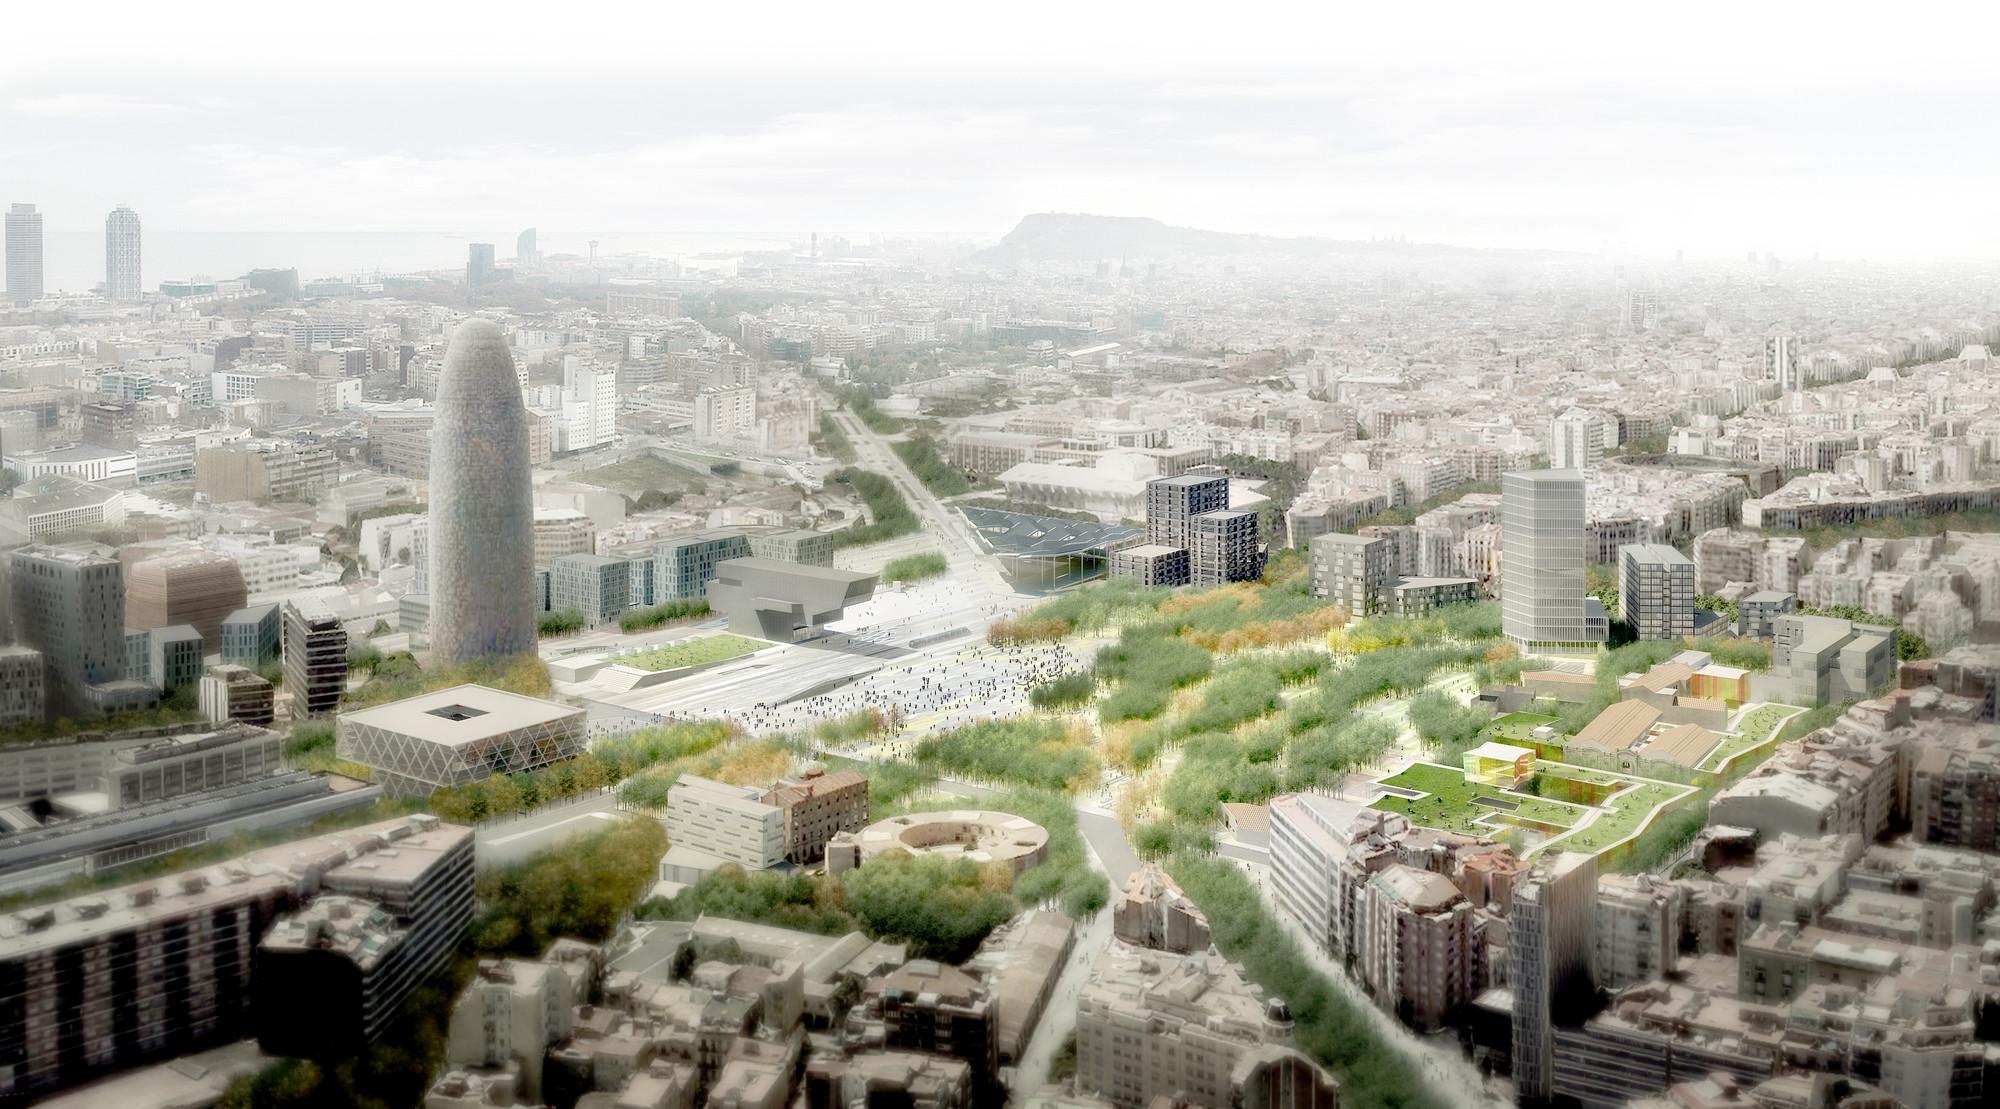 Vista general. Image Courtesy of UTE Fuses Viader + Perea + Mansilla + Desvign